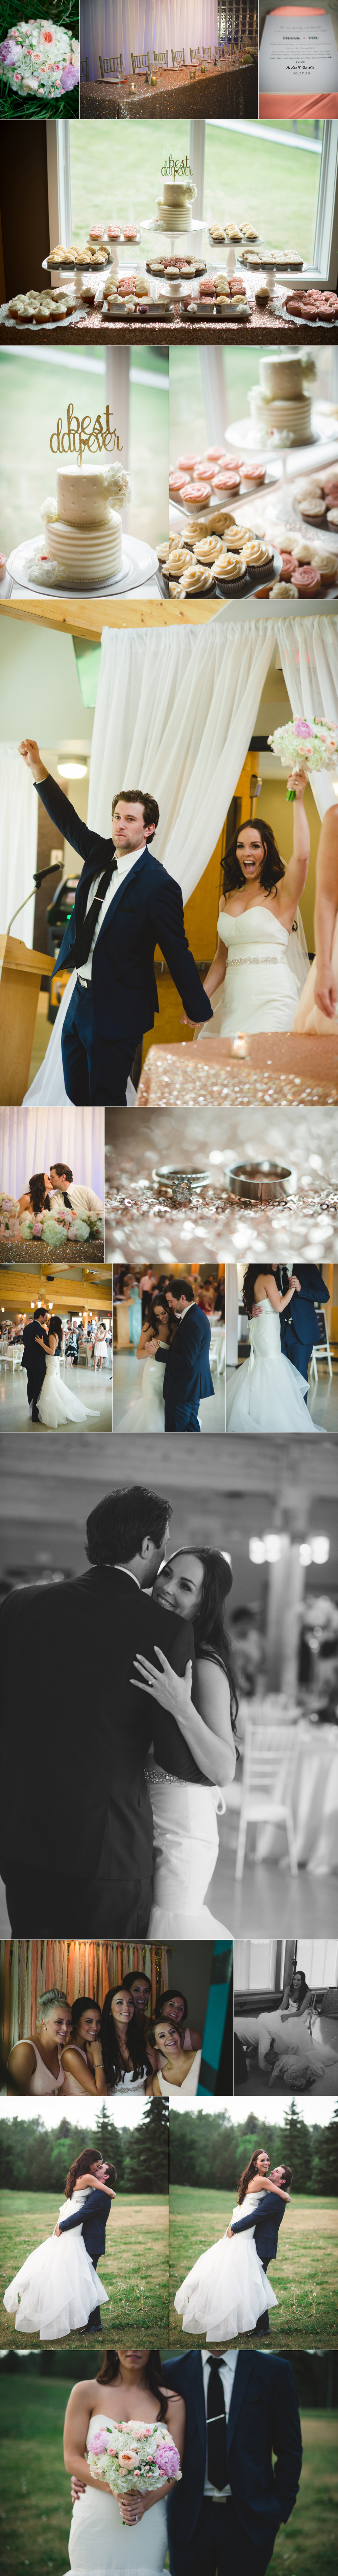 bbcollective_yeg_wedding_photography_caitlinandandre_blog